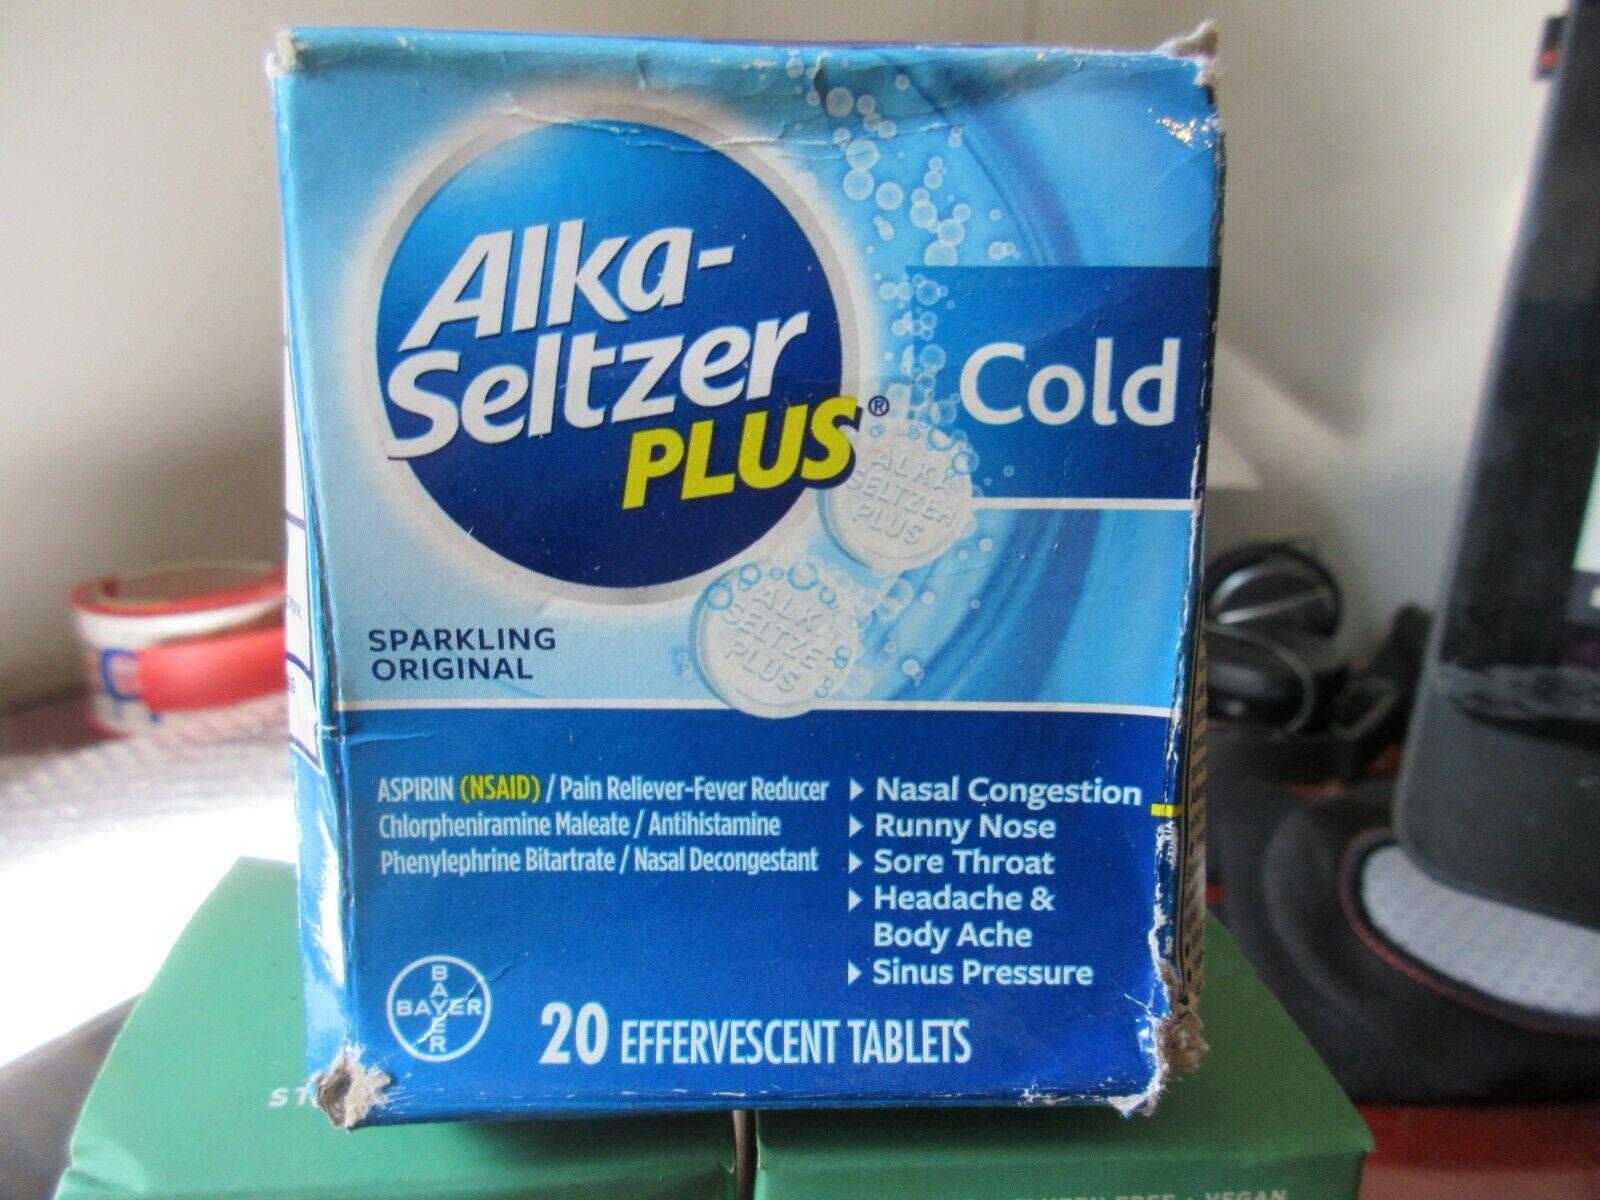 Alka-Seltzer Plus Cold Formula Effervescent Tablets Original